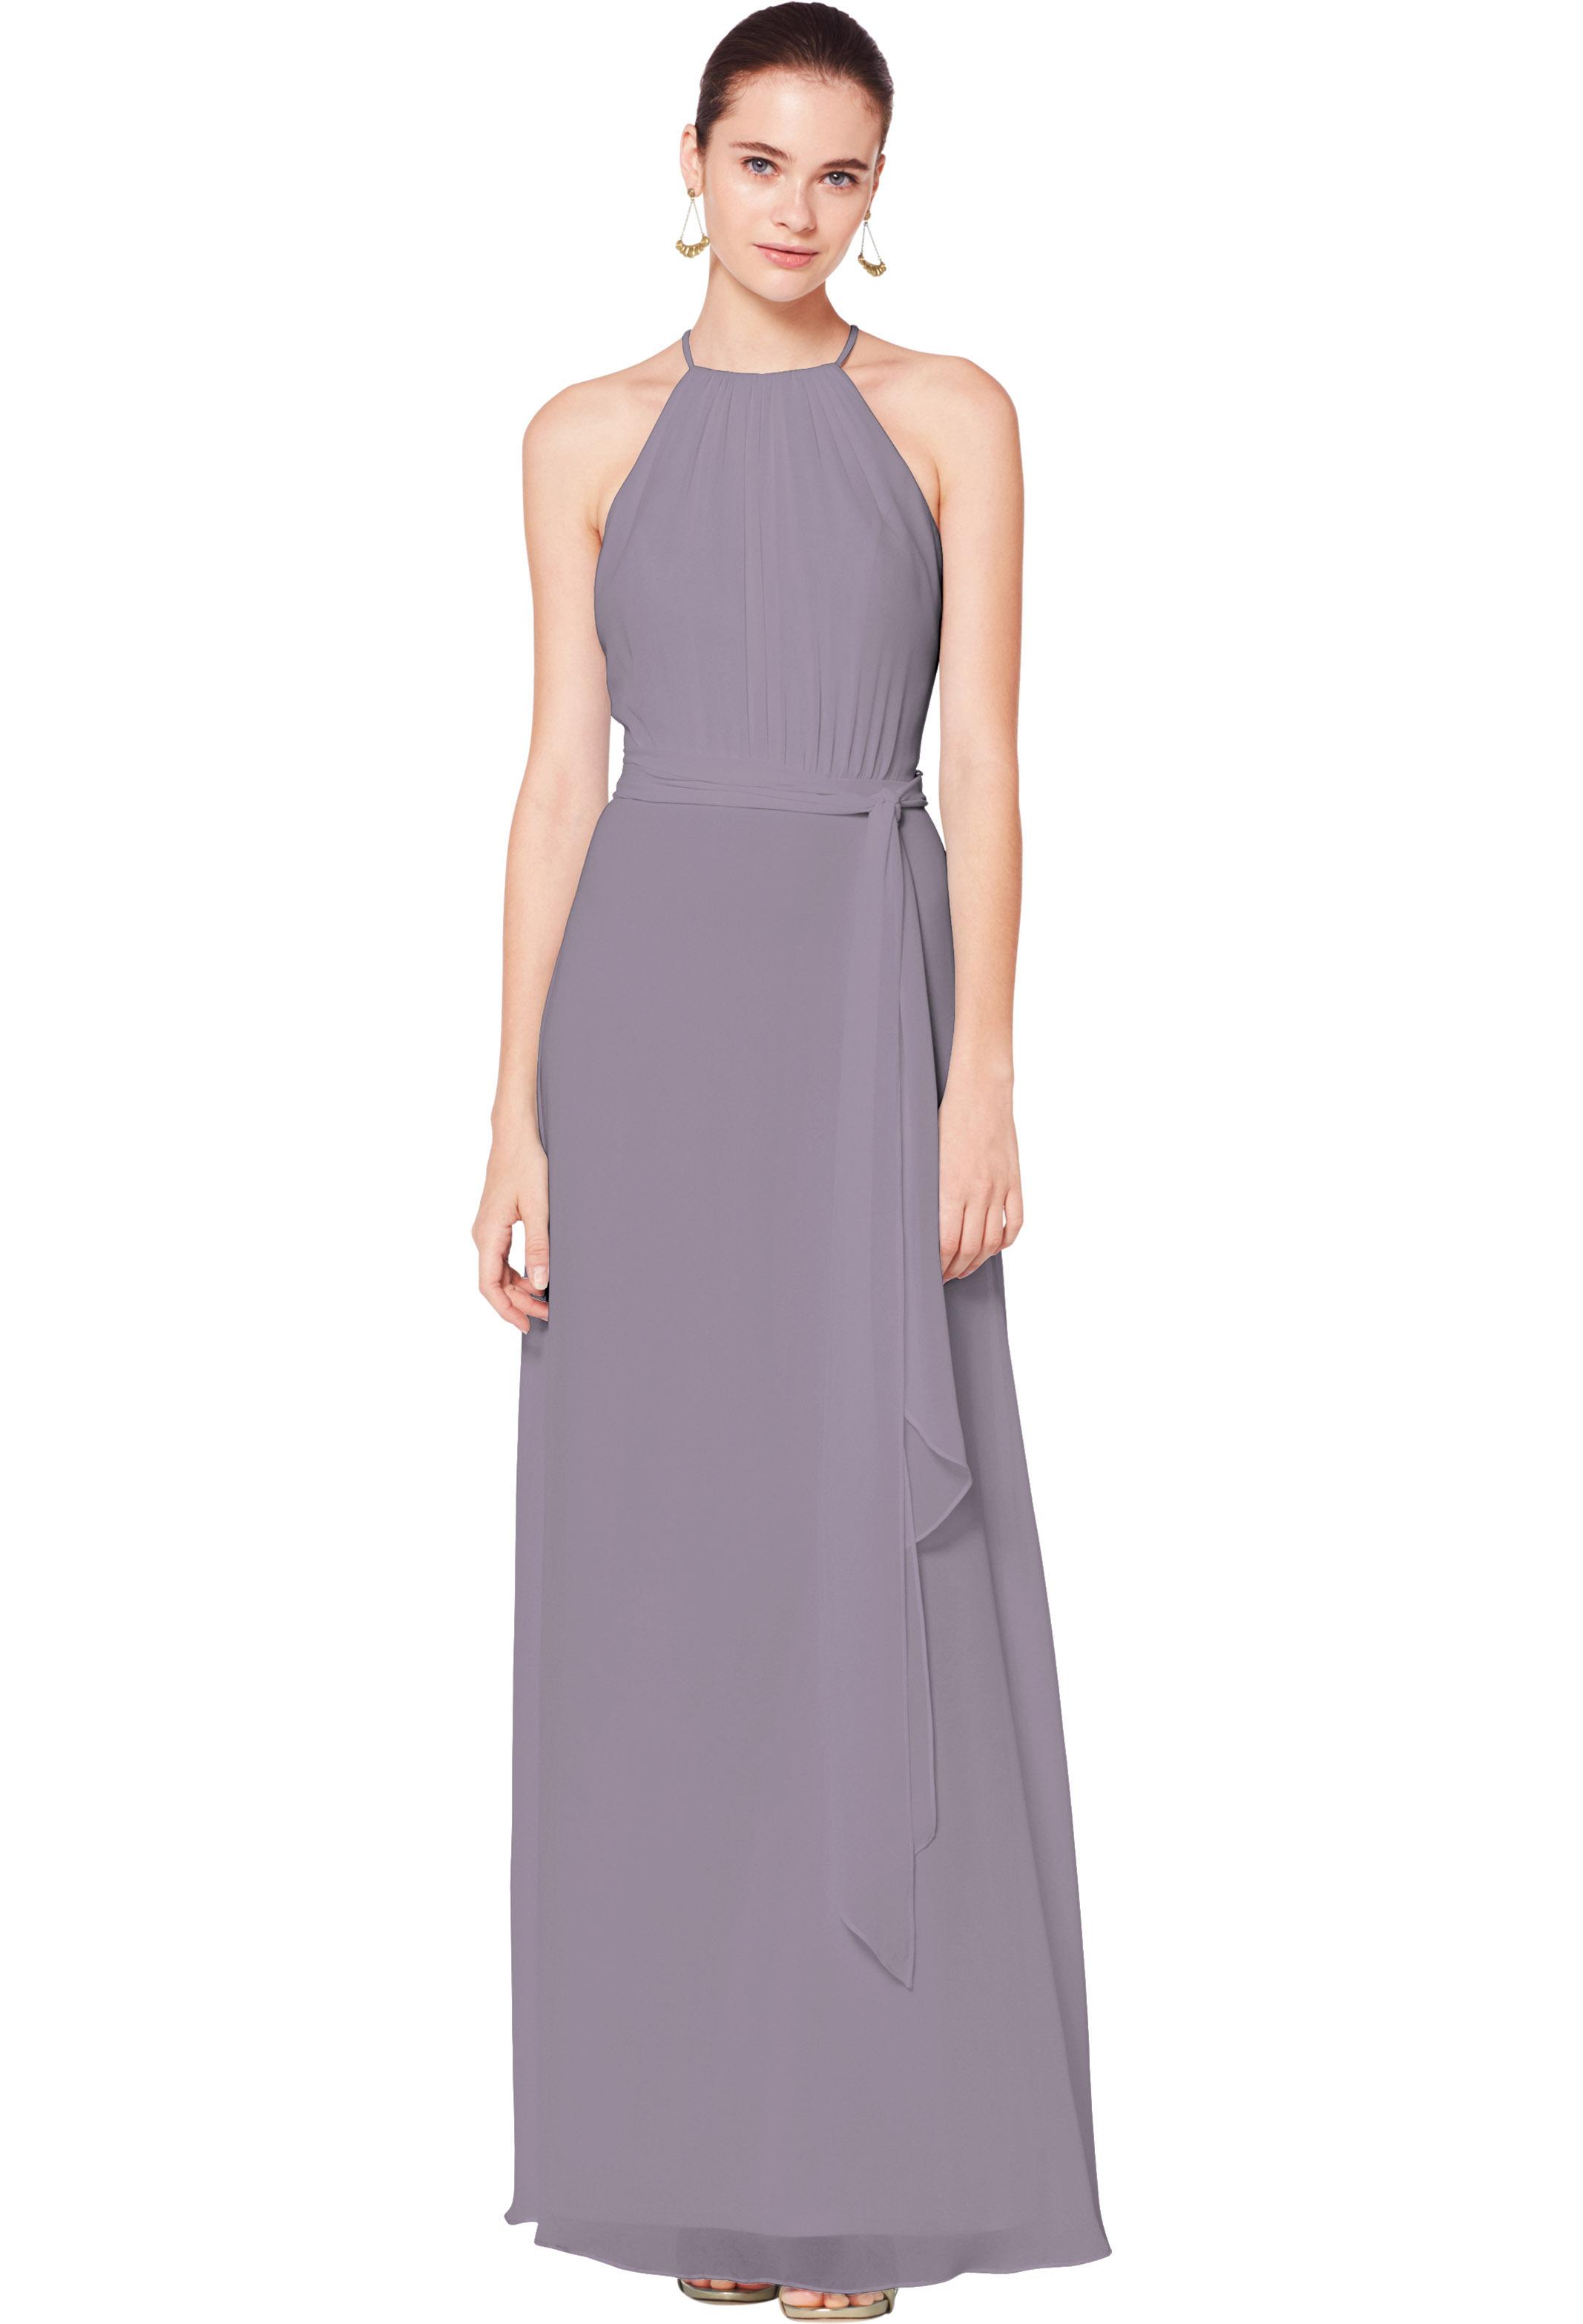 Bill Levkoff HEATHER Chiffon Illusion A-line gown, $180.00 Front